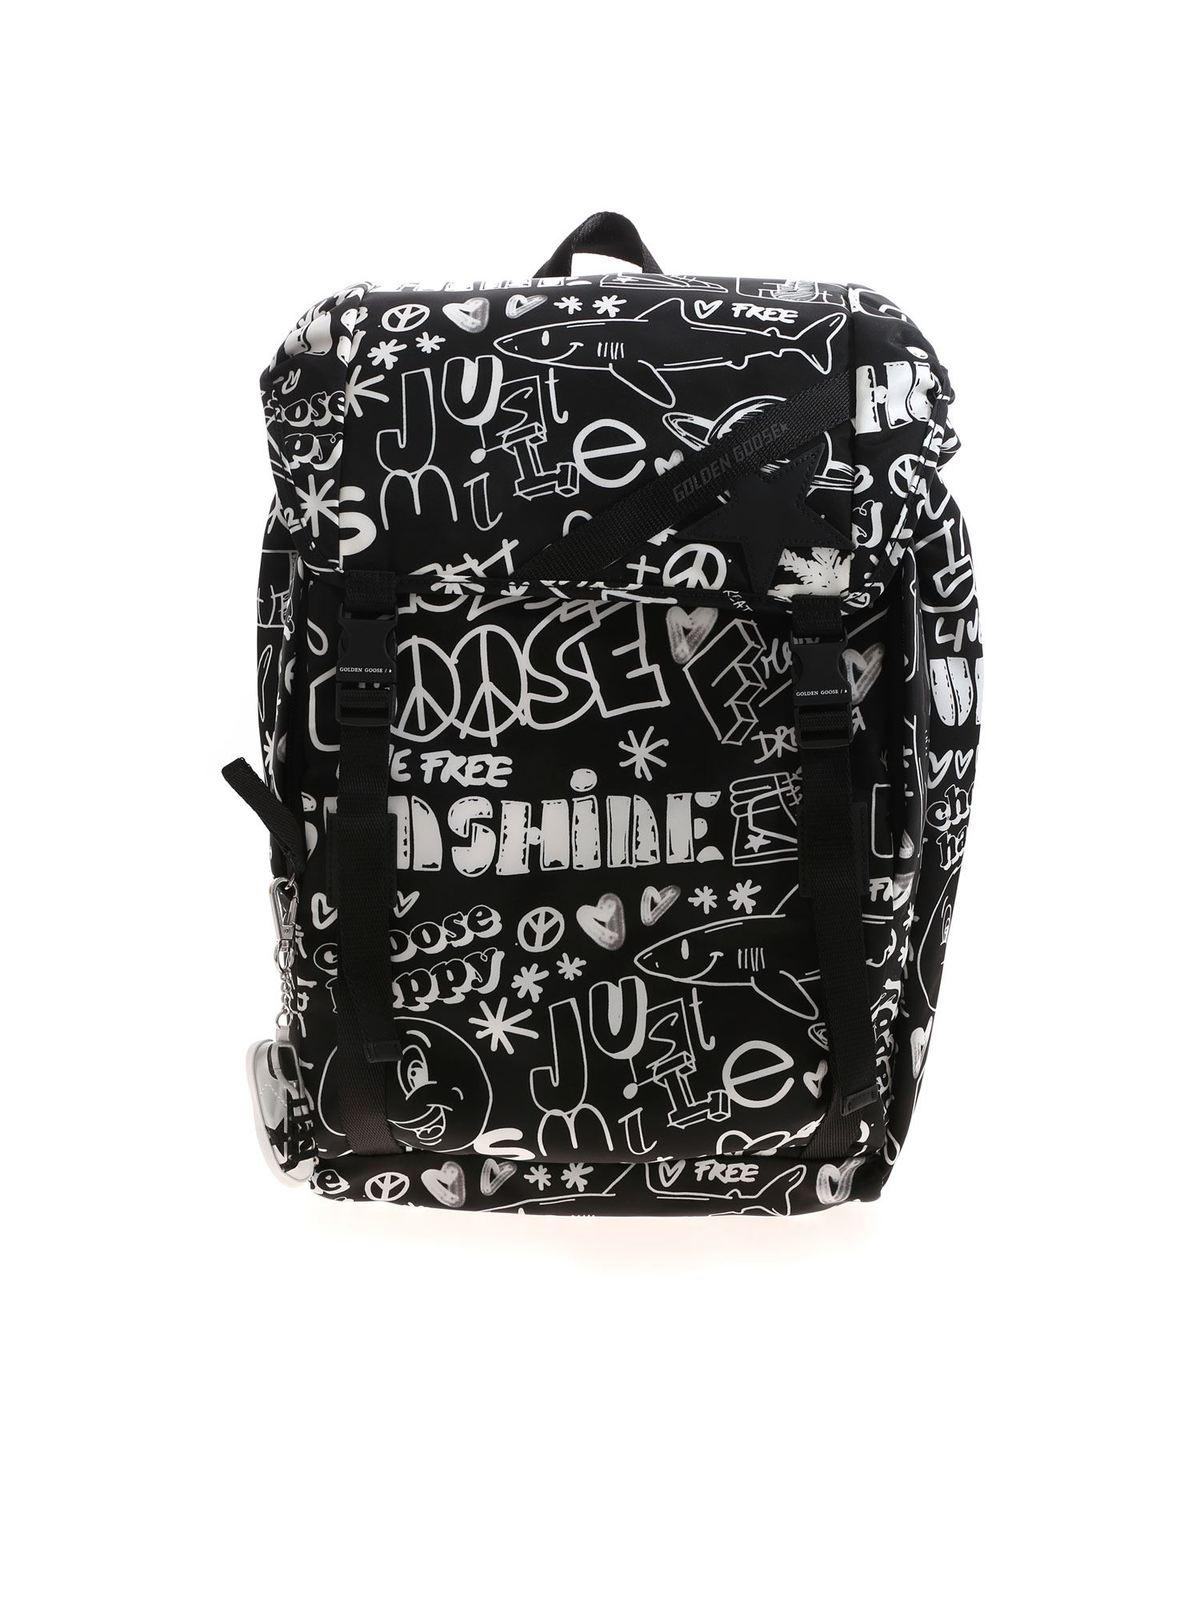 Golden Goose Backpacks PRINTED JOURNEY BACKPACK IN BLACK AND WHITE